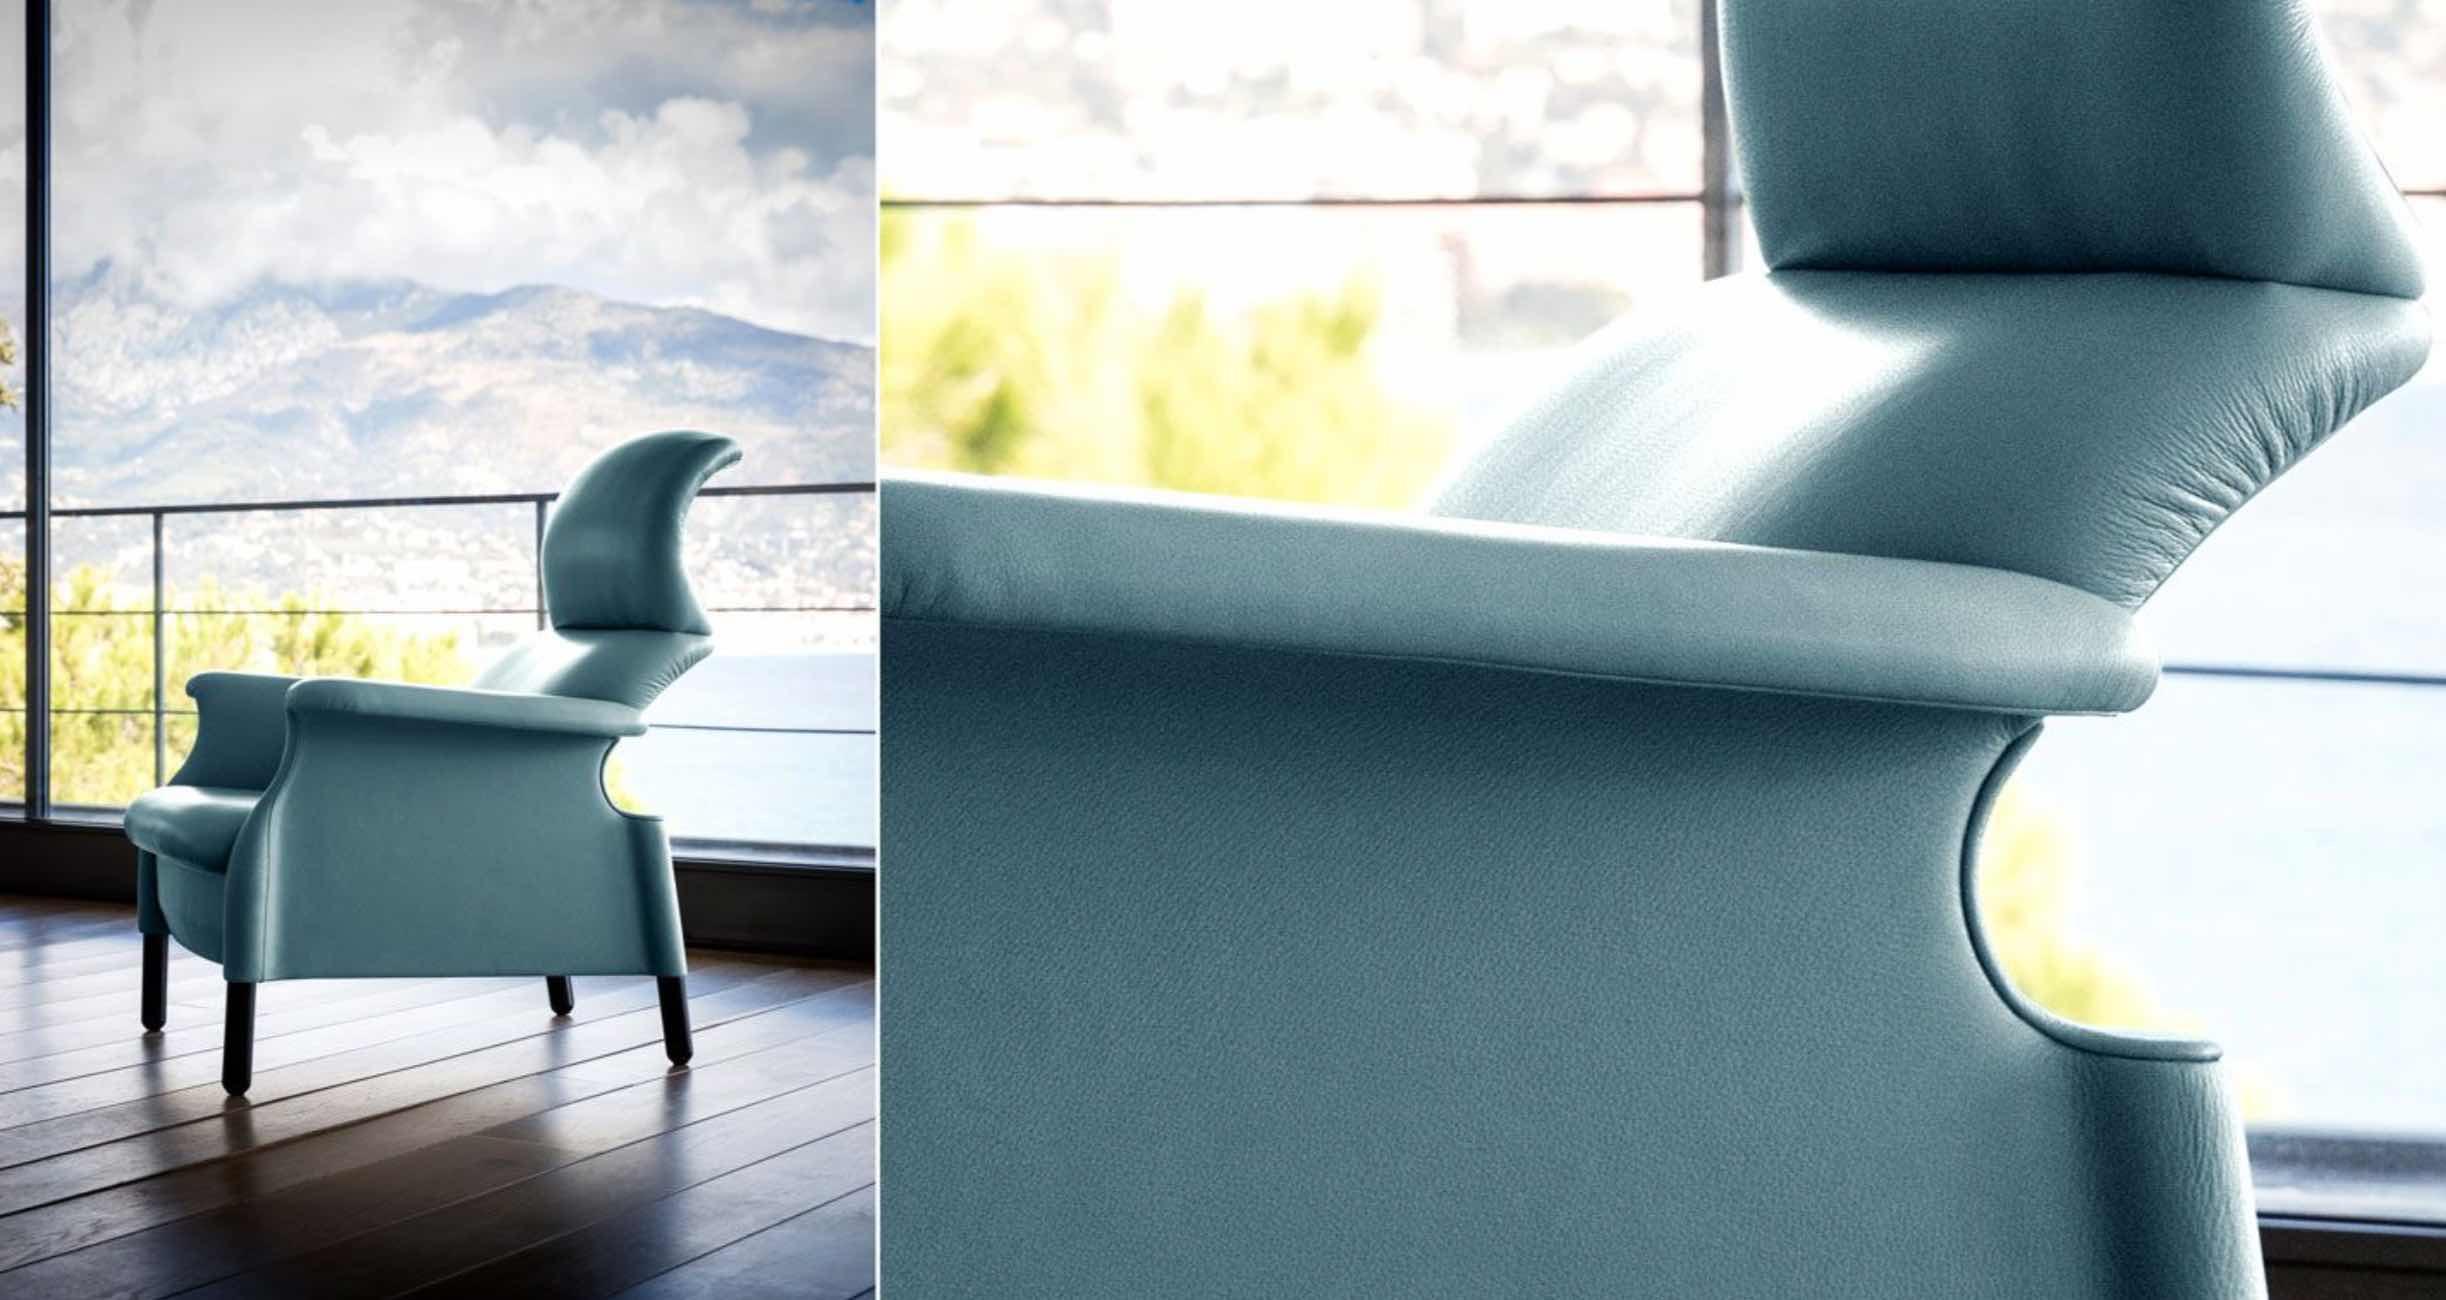 Sanluca | design- Achille & Pier Giacomo Castiglioni | Poltrona Frau